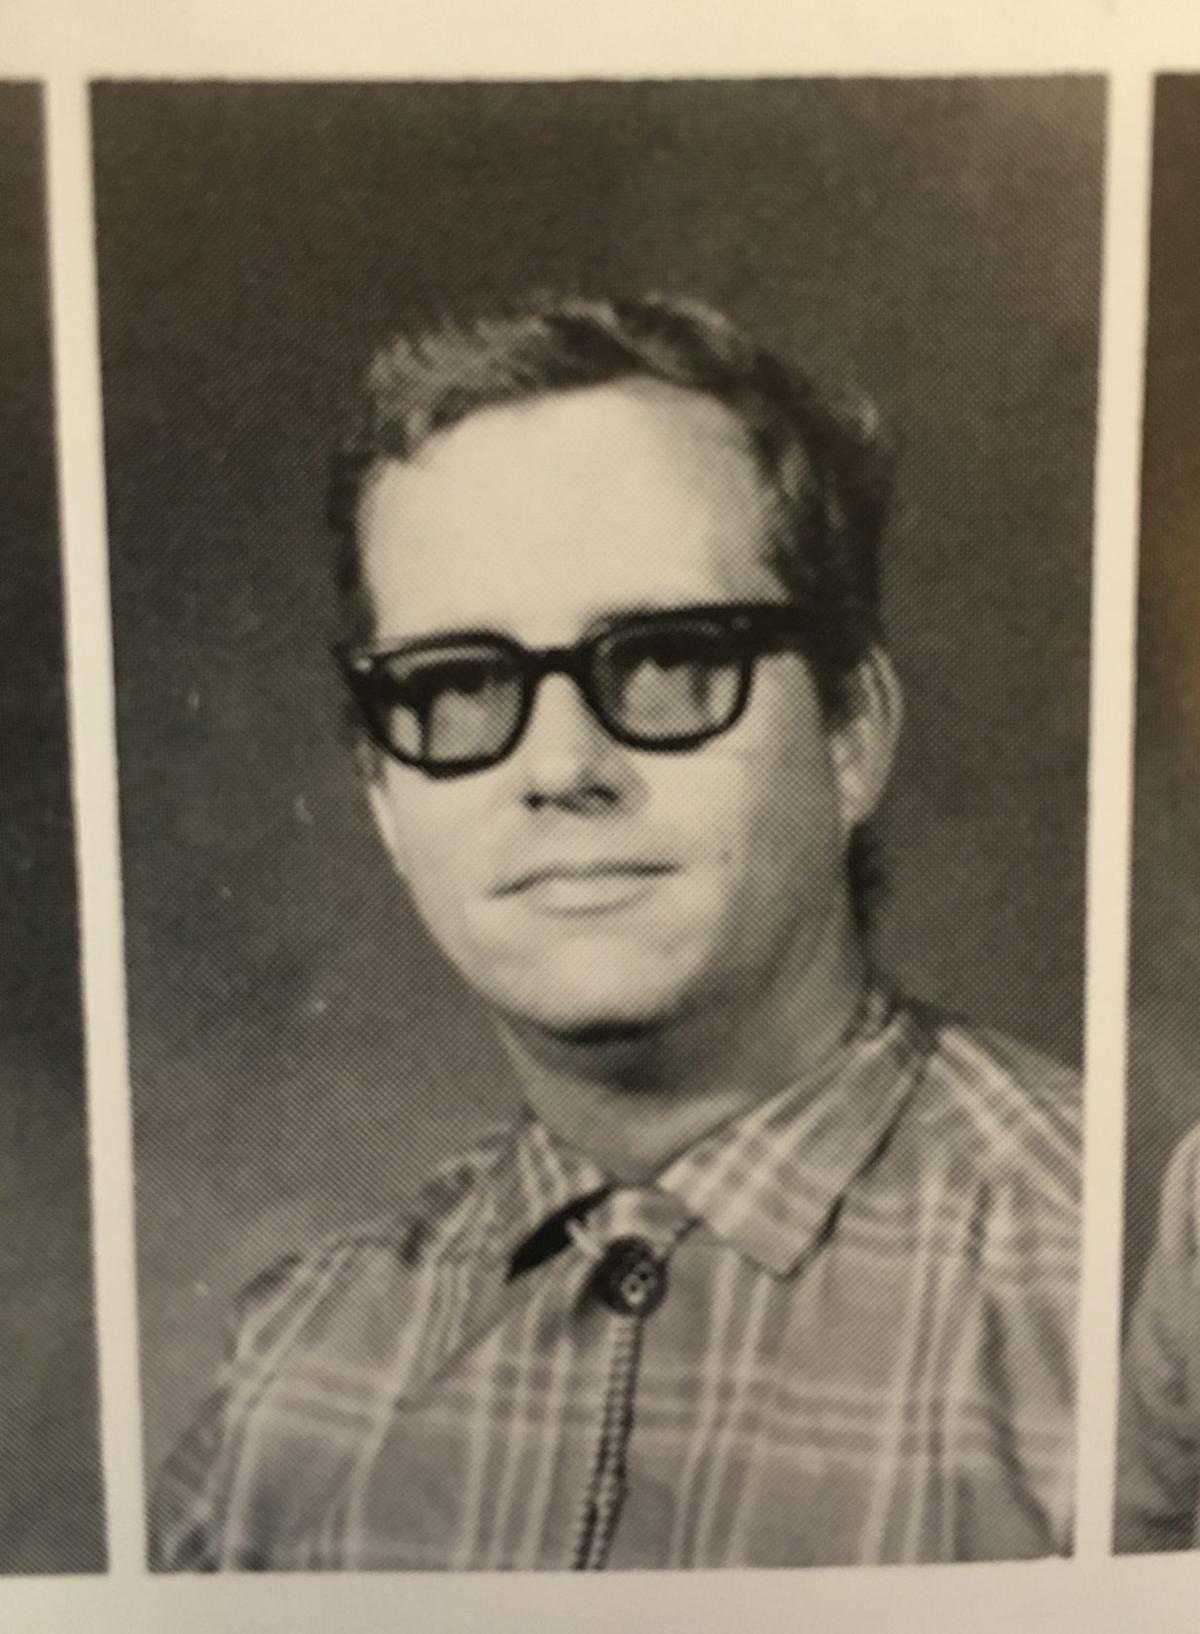 James Jensen, 1973